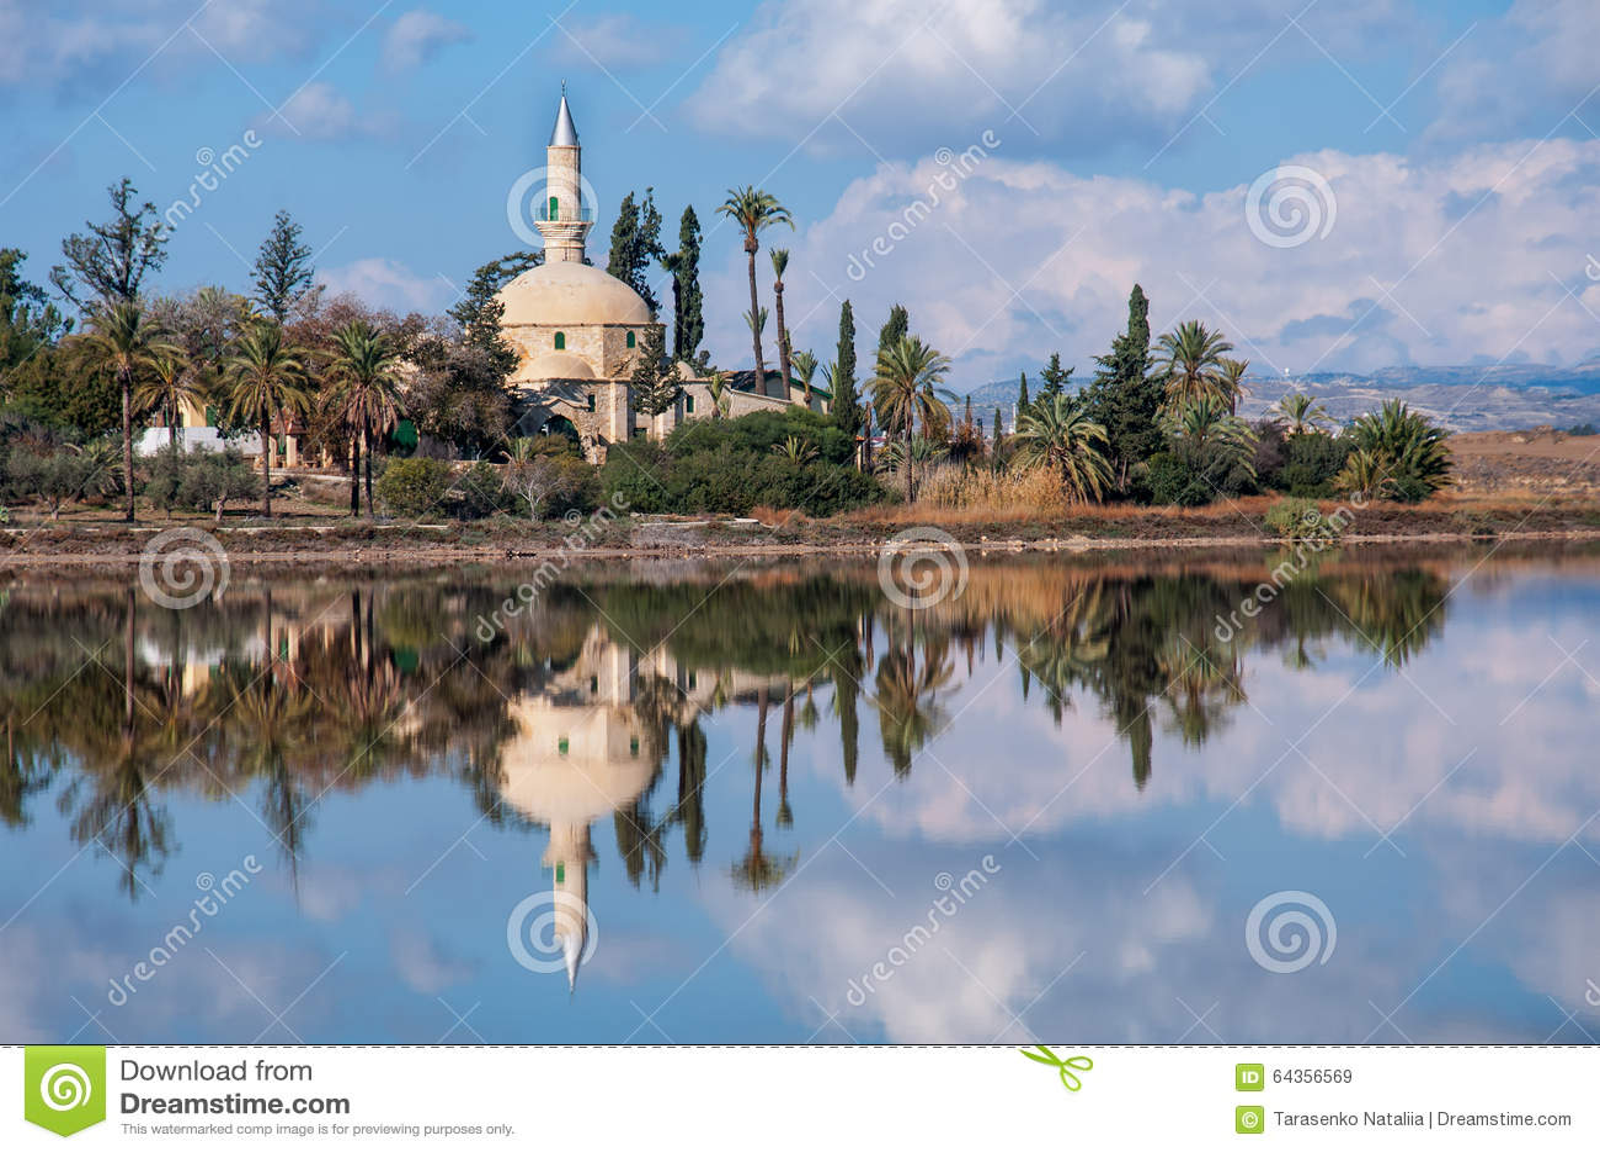 Hala Sultan Tekke i Cypern